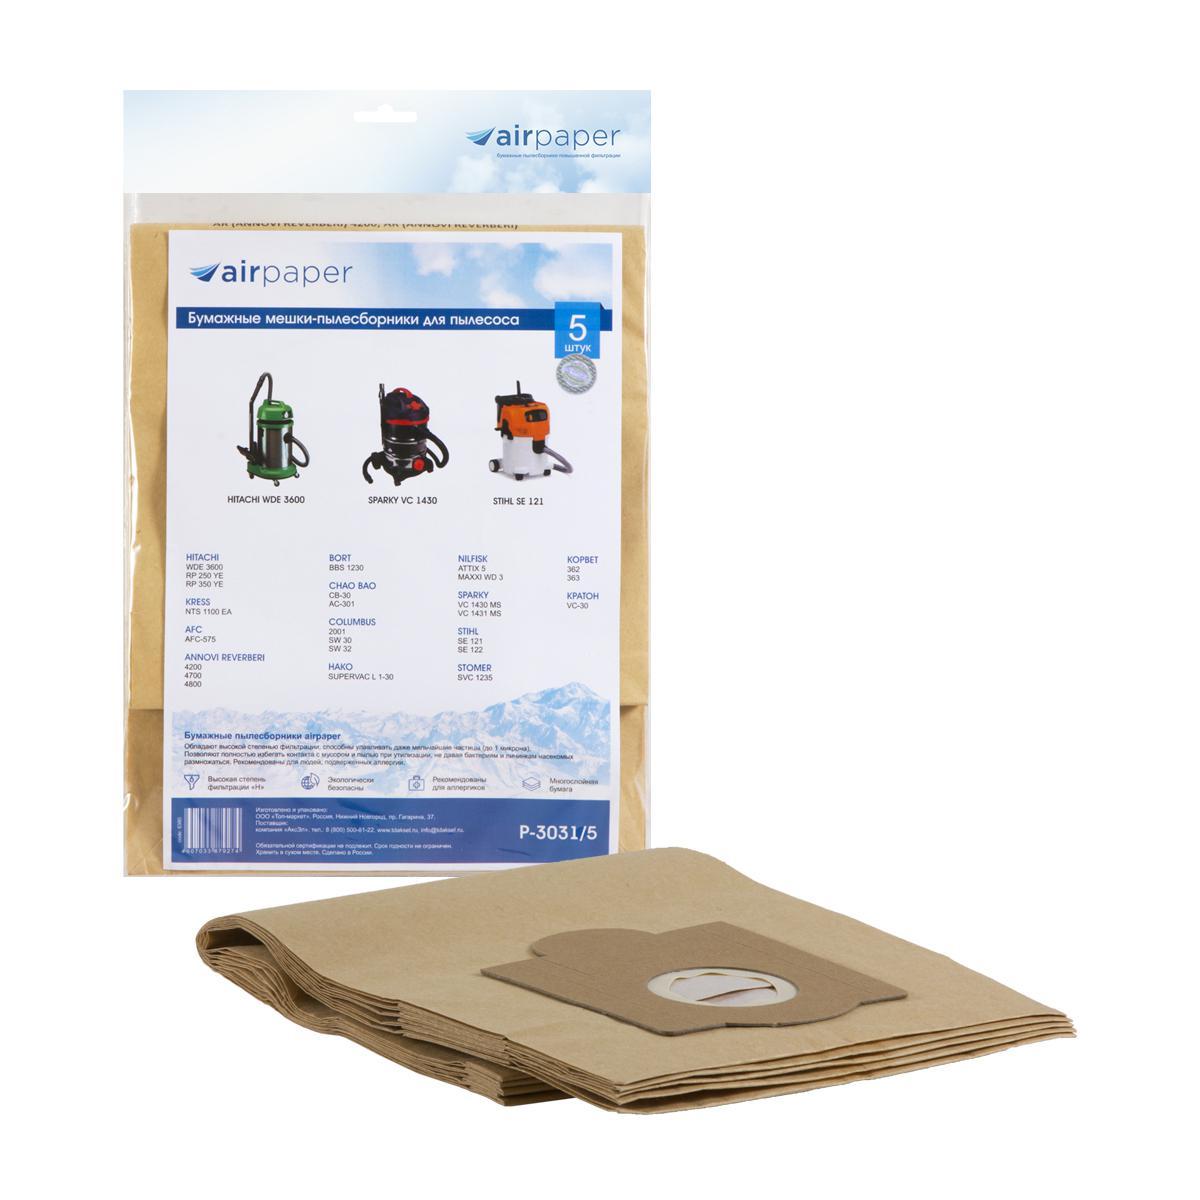 Мешок Air paper P-3031/5 мешок air paper p 3031